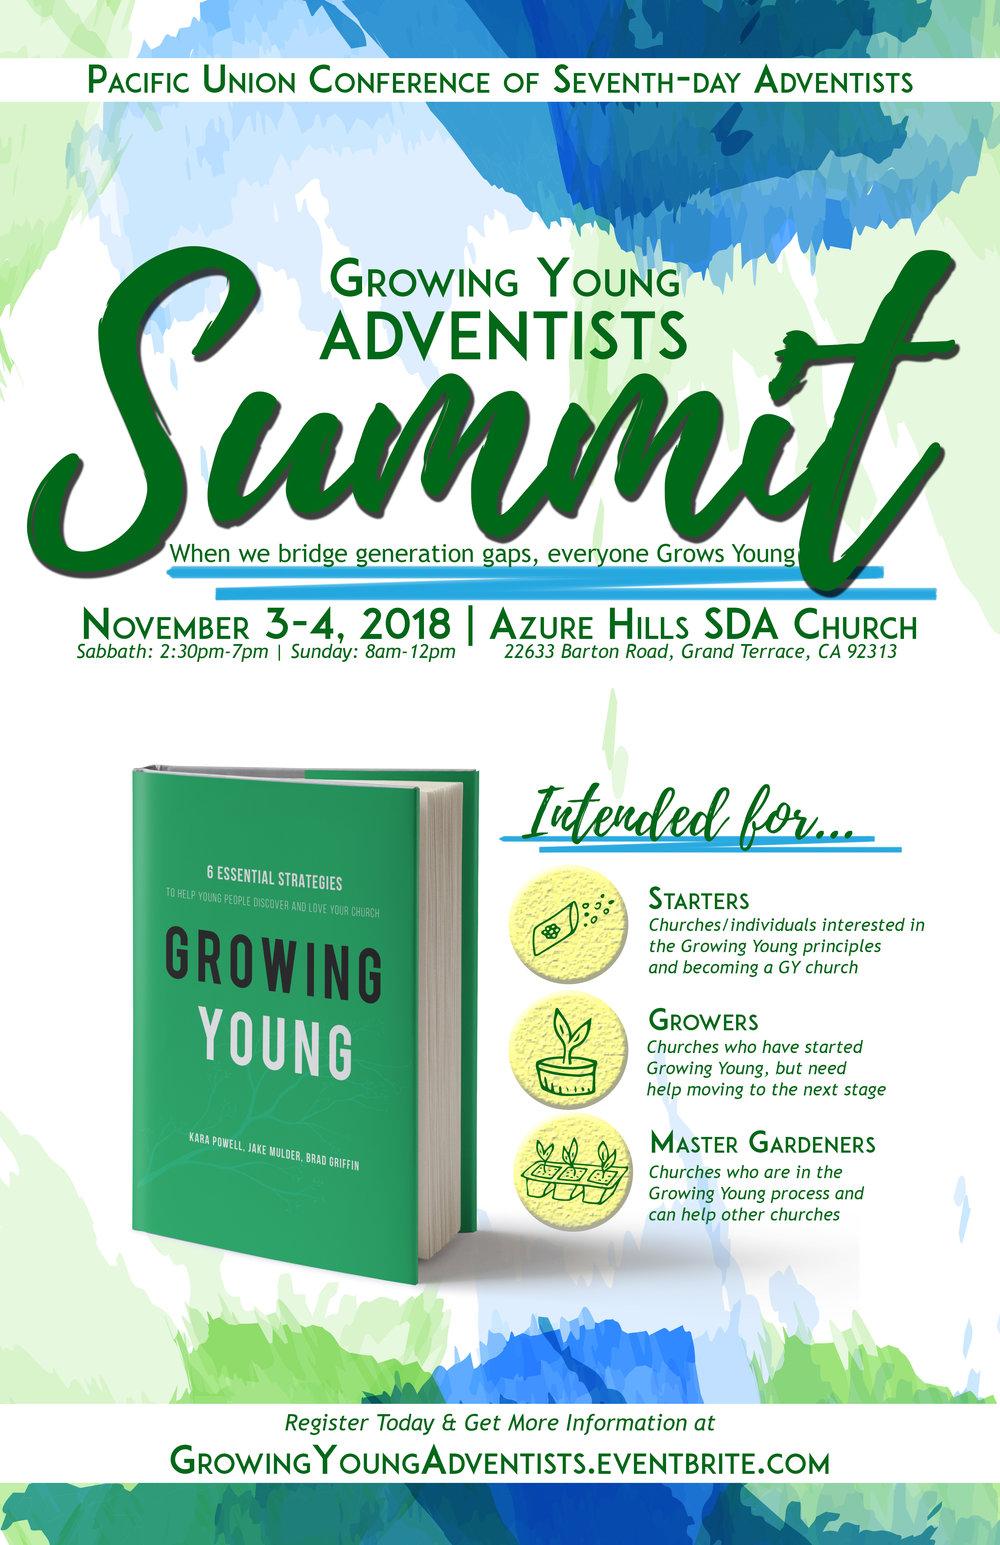 GY Adventist Summit 2018 Poster-4.jpg